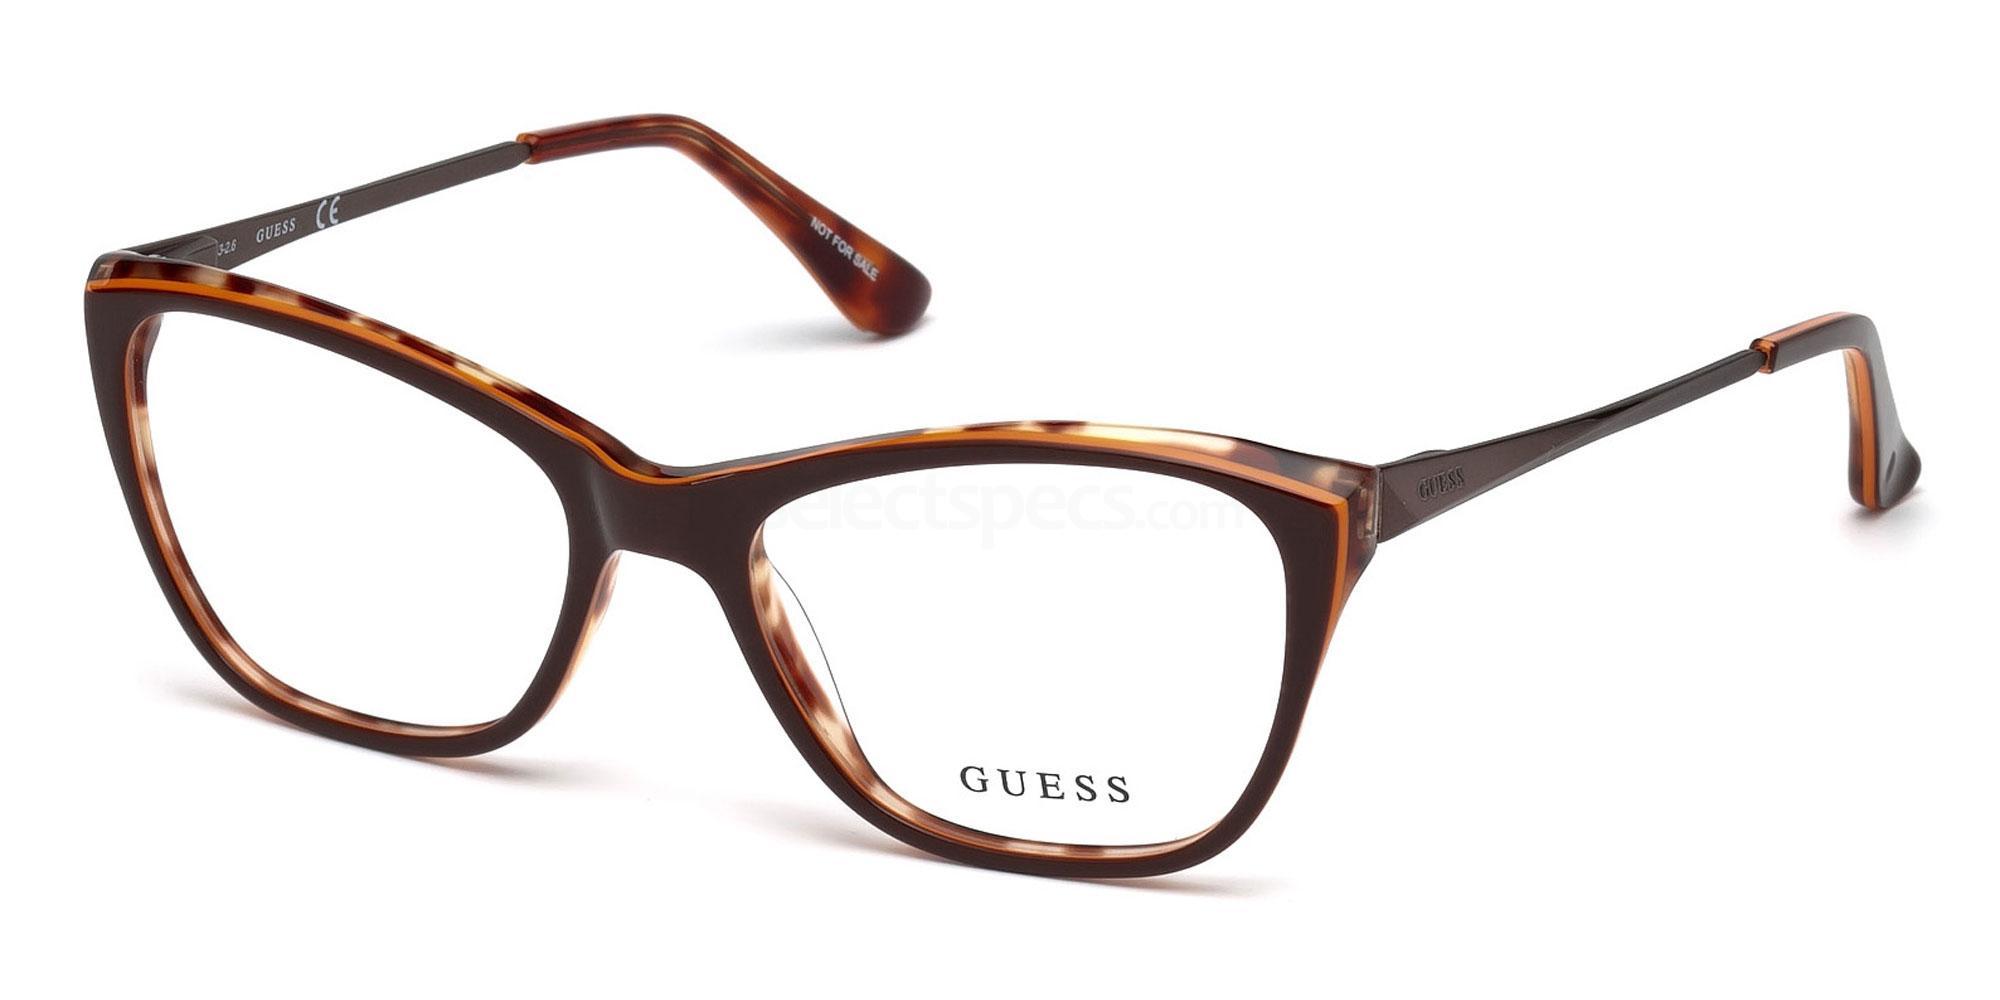 050 GU2604 Glasses, Guess